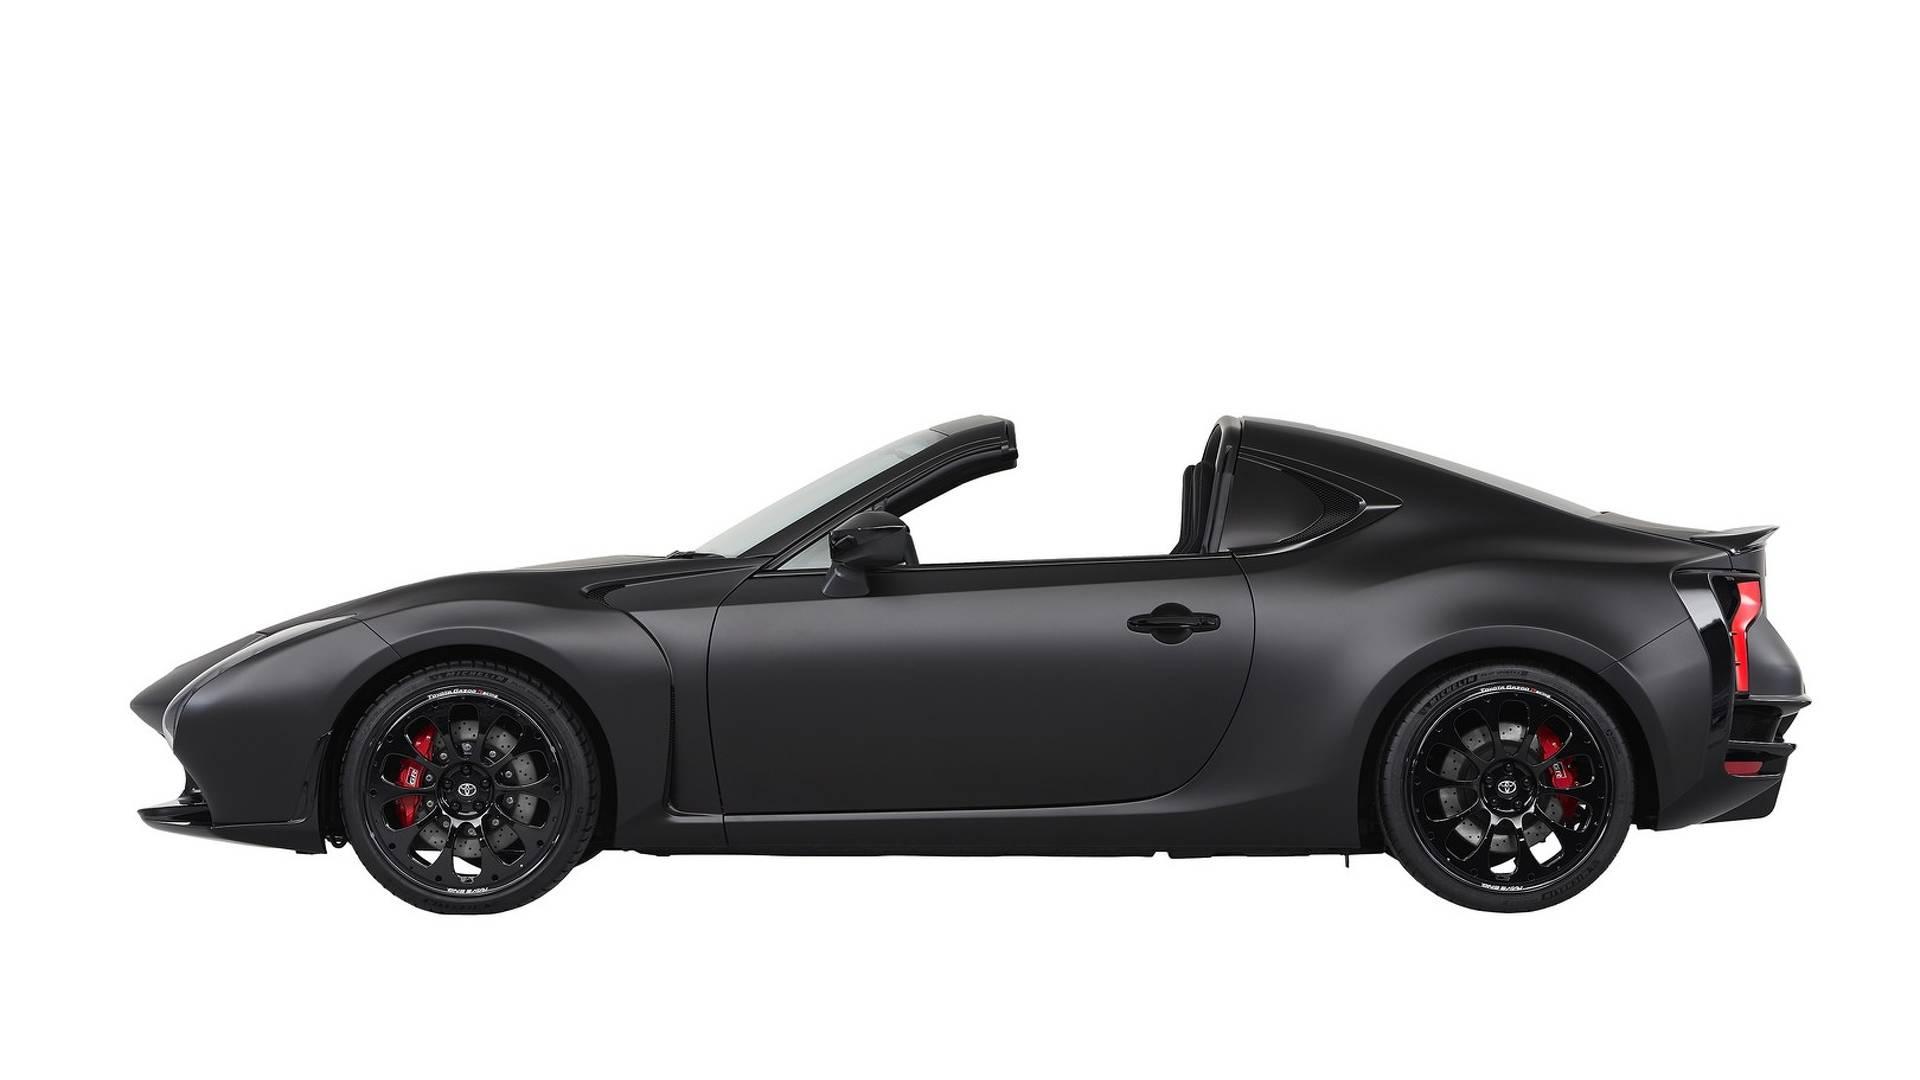 Oficial: Toyota GR HV Sports Concept, ¿el anticipo del nuevo GT 86, o...?